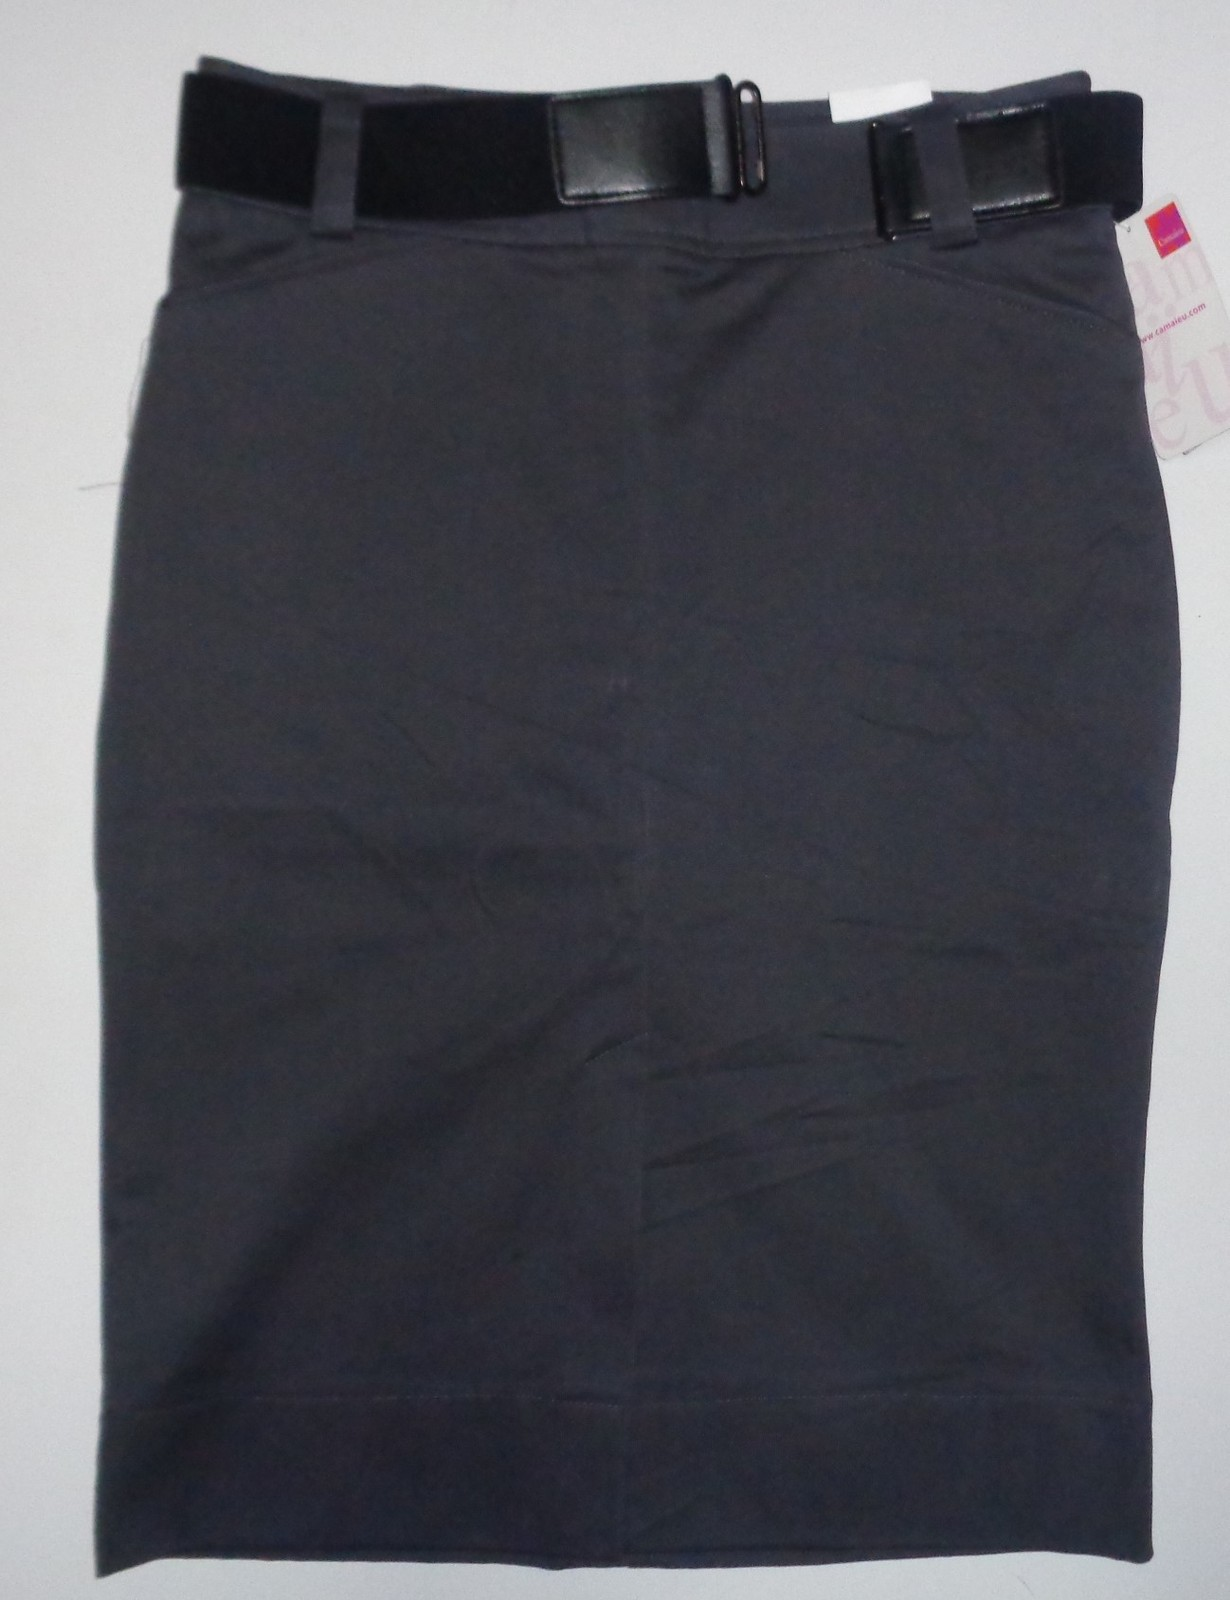 Camaieu Gray Pencil Skirt Black Belt NWT Sz 8